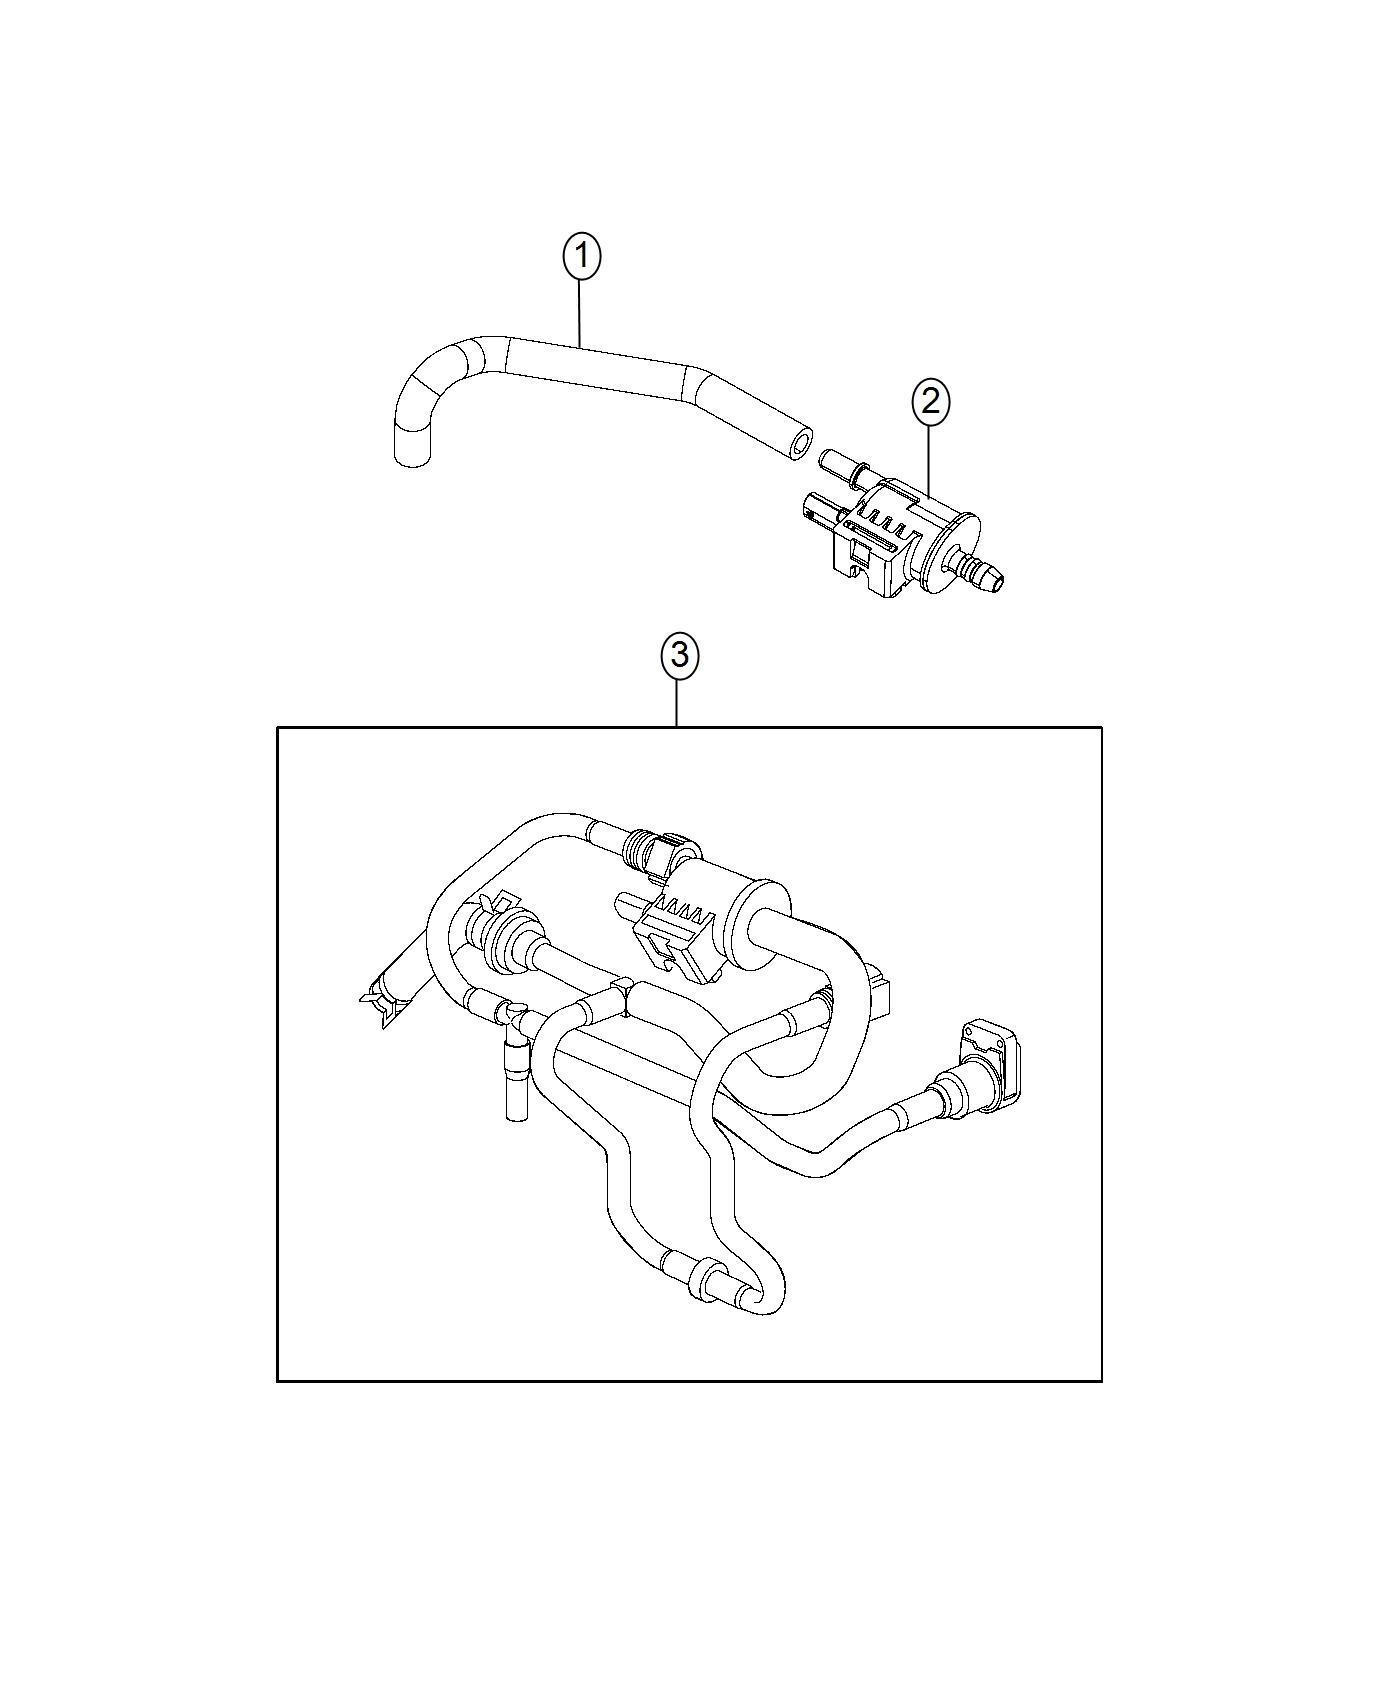 Jeep Compass Valve. Purge control. Export. Engine